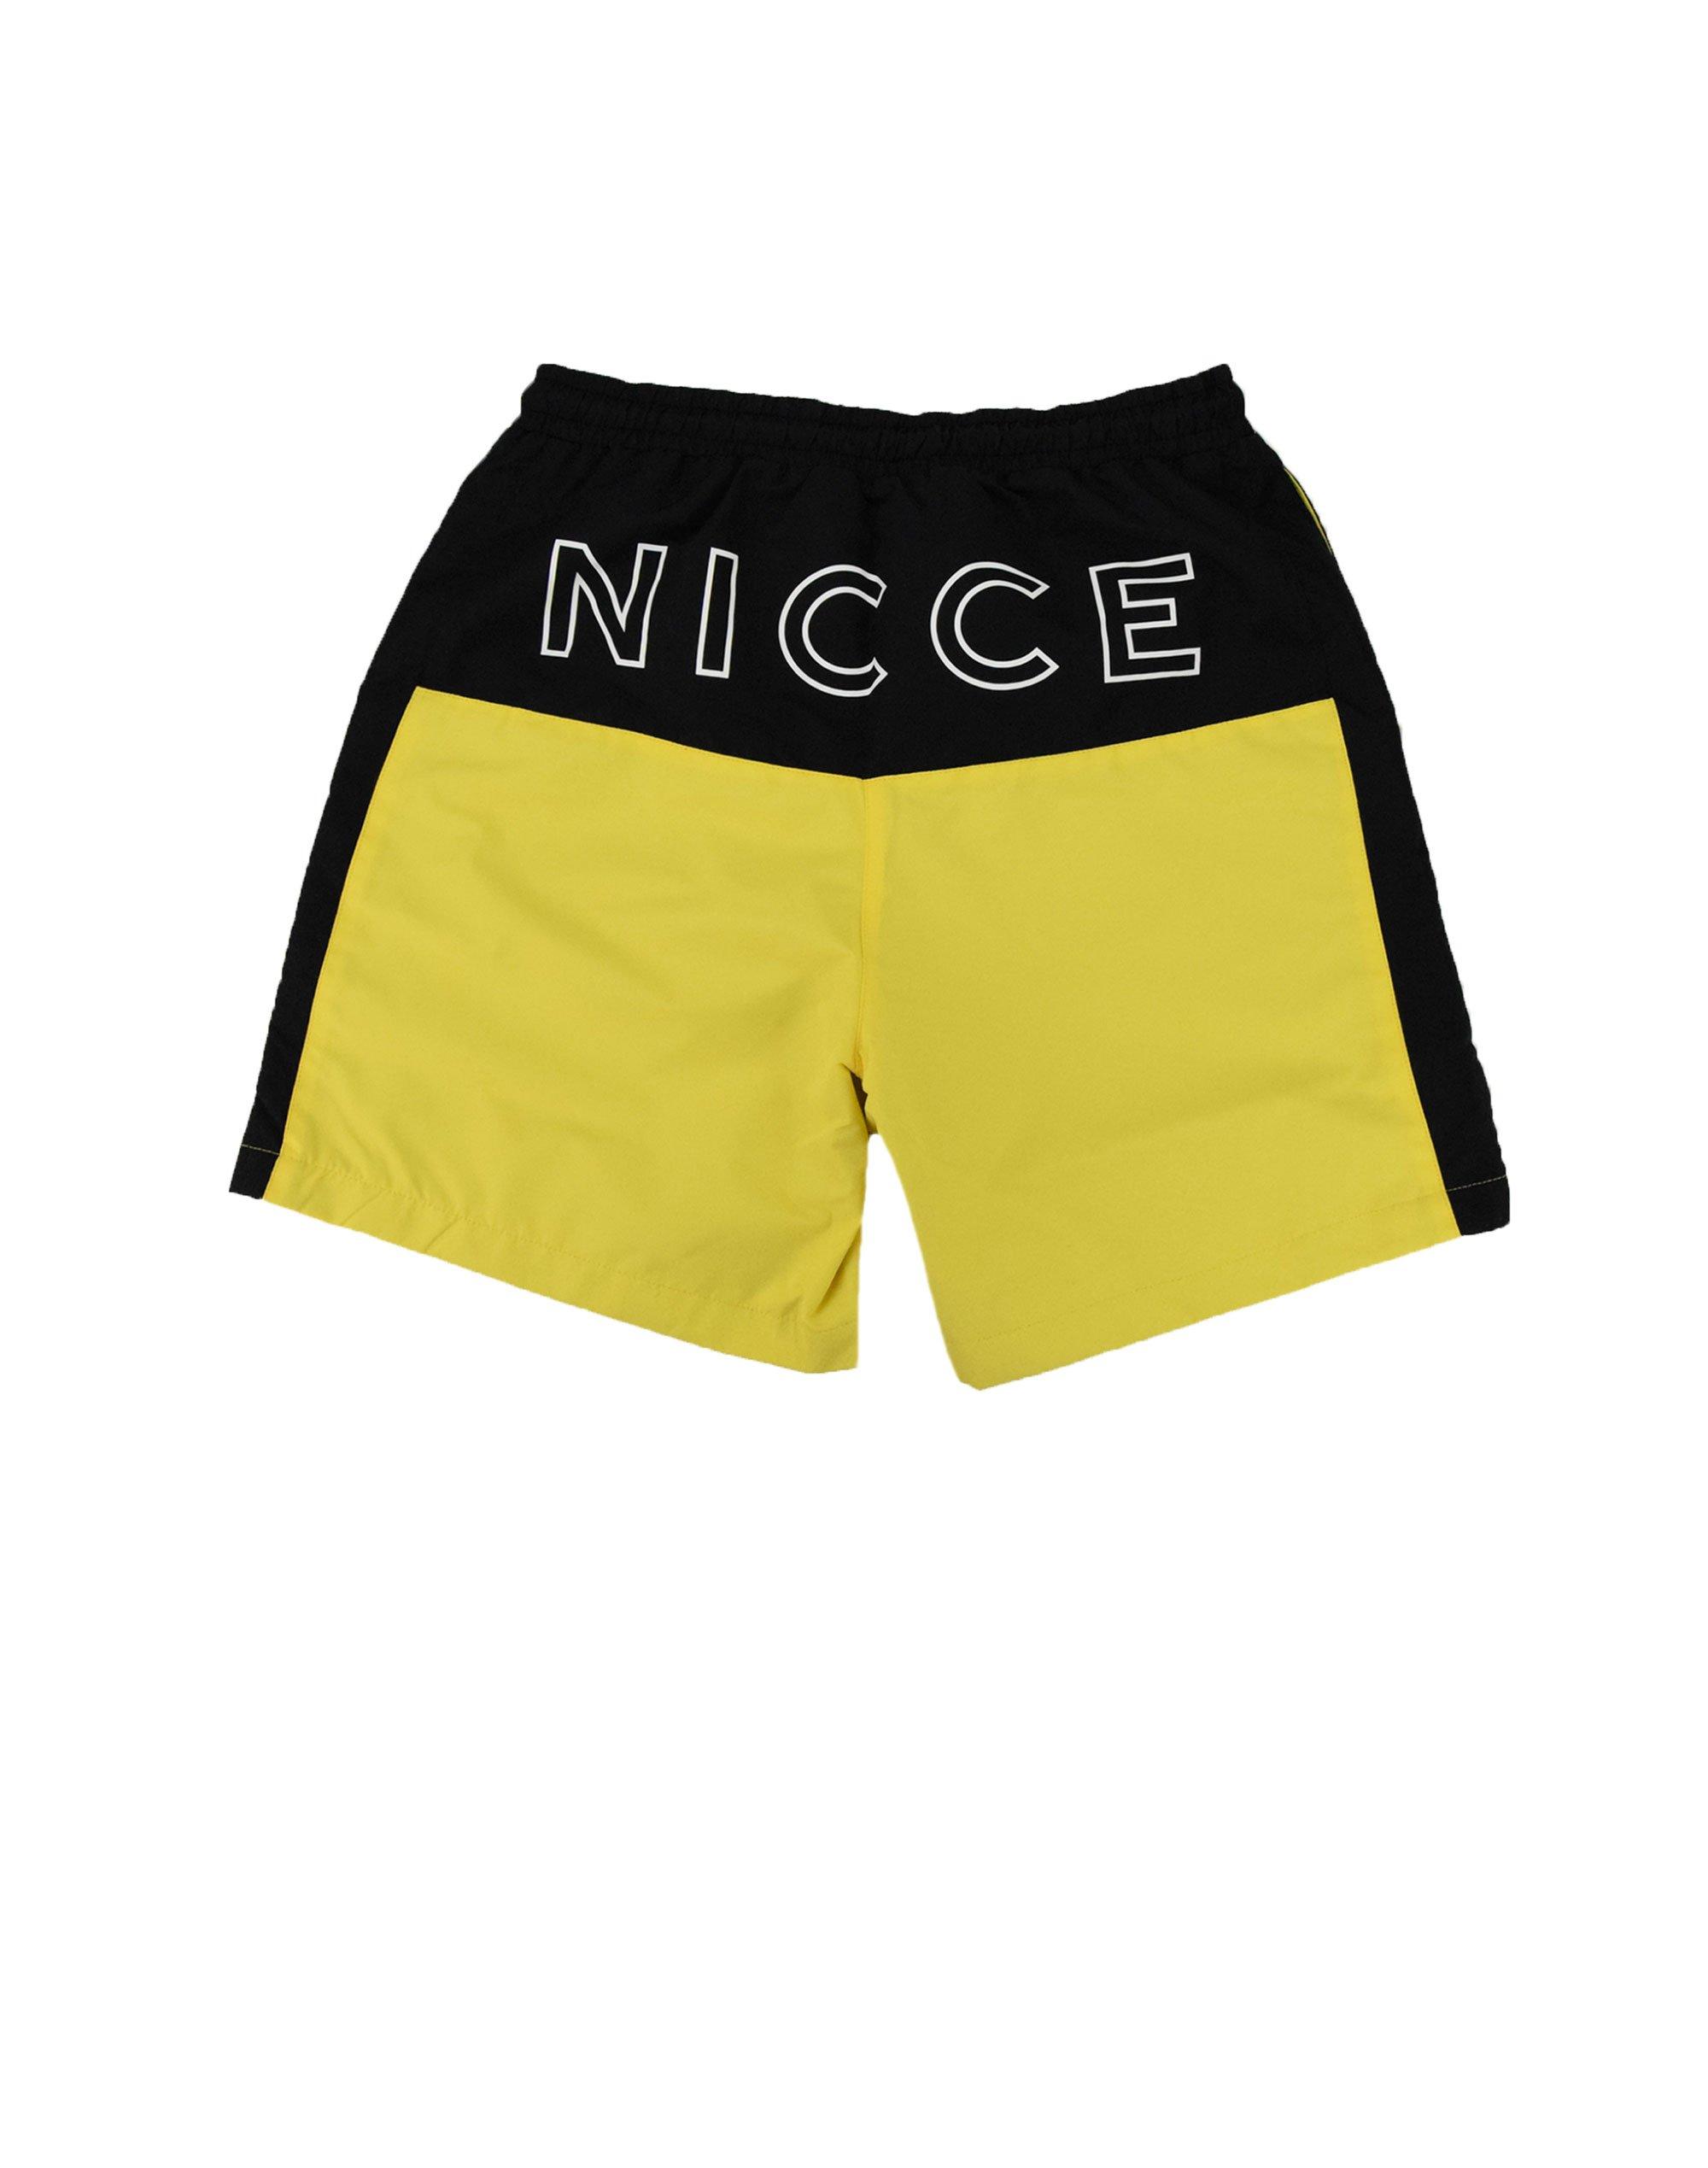 Nicce Byron Swim Shorts (191-1-14-01-0040) Black/Vibrant Yellow